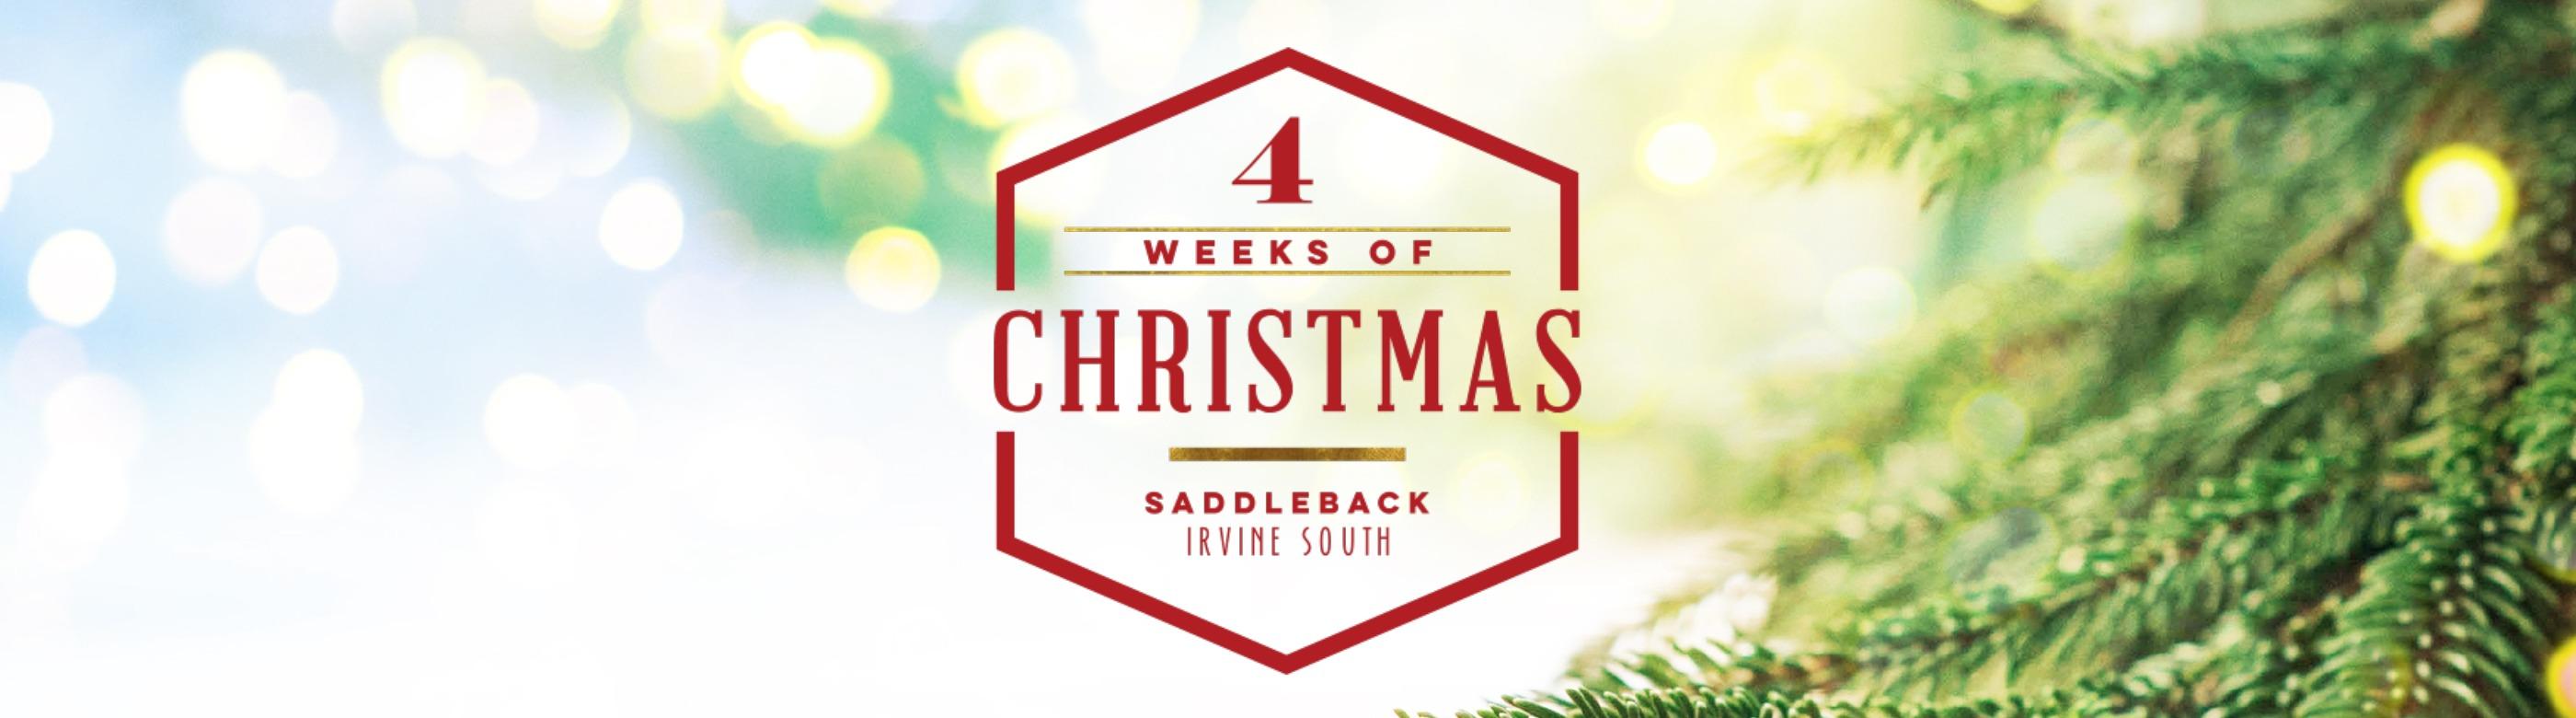 2016-12-christmas4weeks-webheader